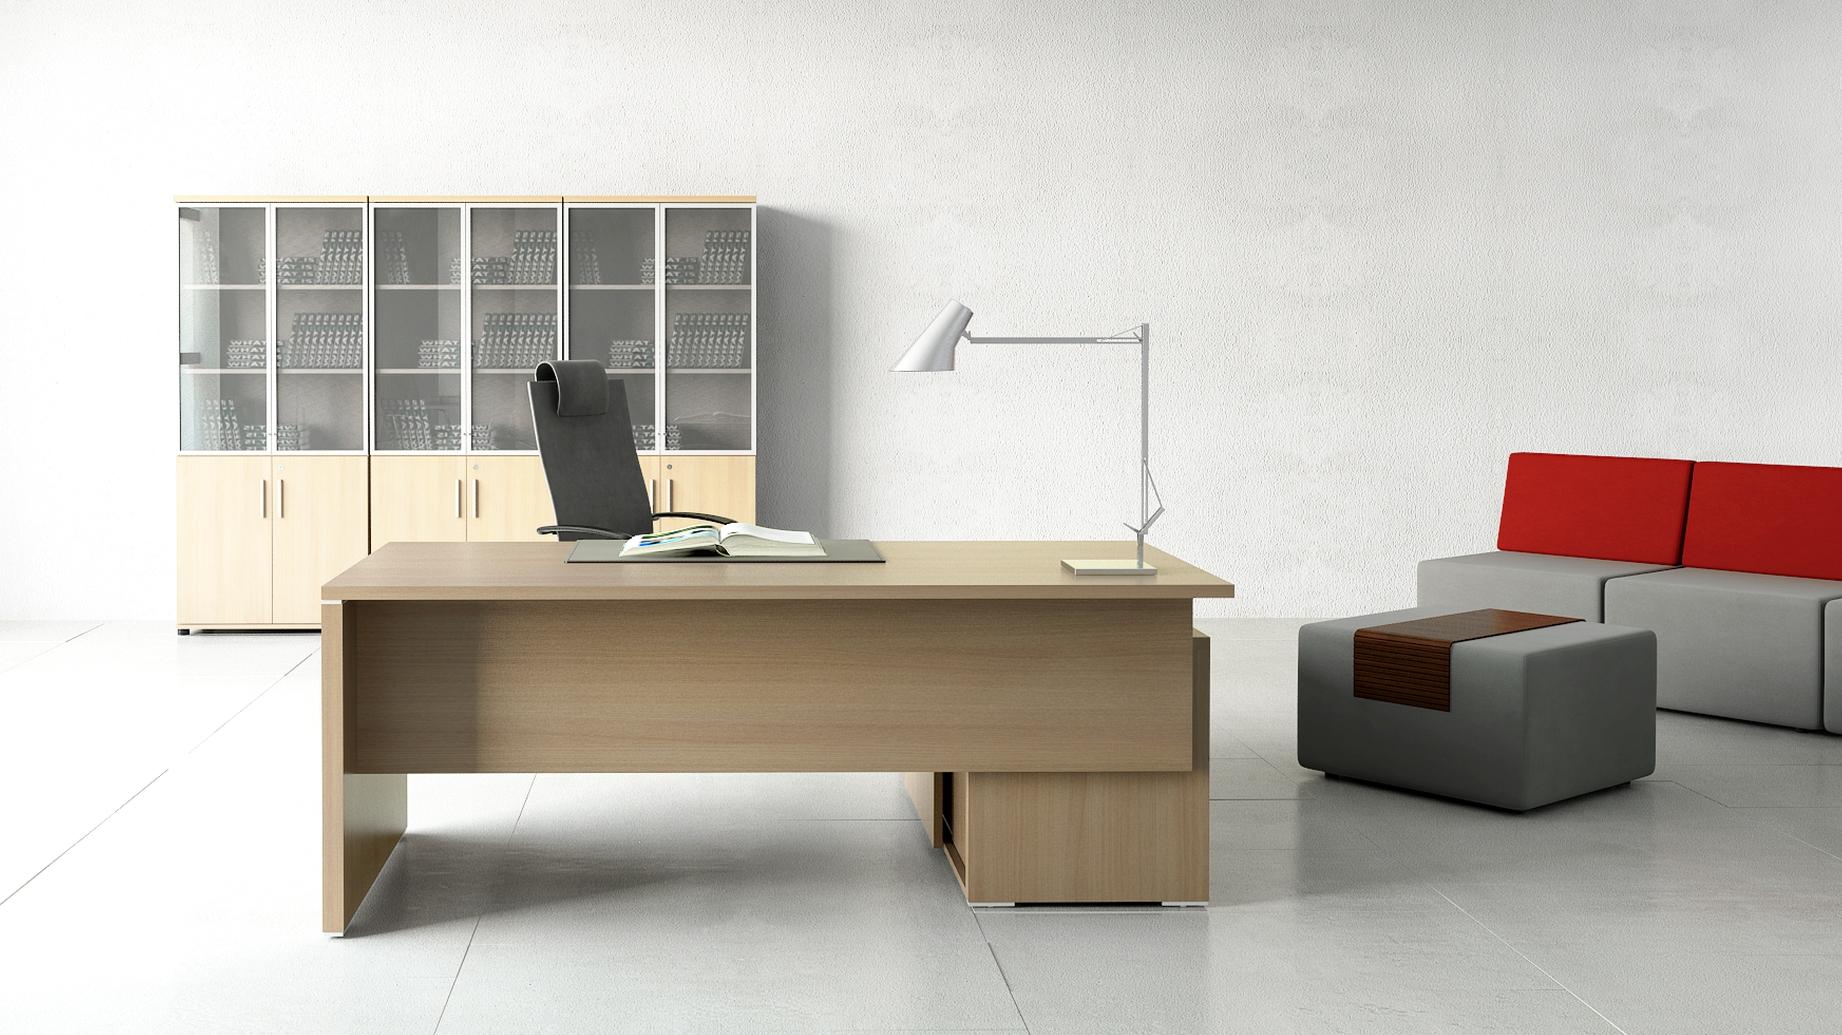 STOCK Büroeinrichtungen - Büromöbelserie mit eleganten ...